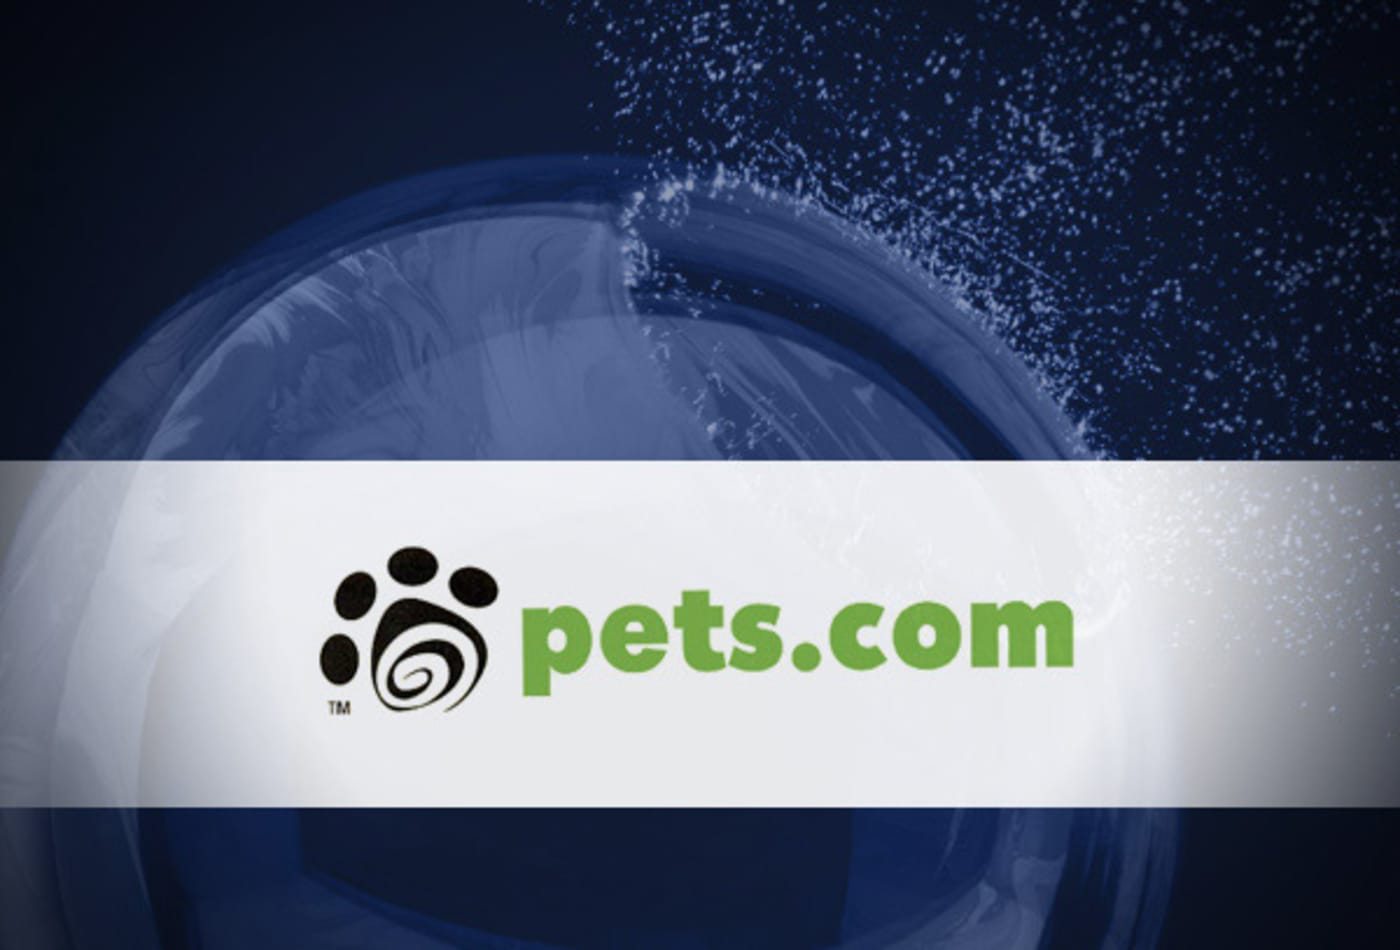 dotcom-busts-pets-com.jpg